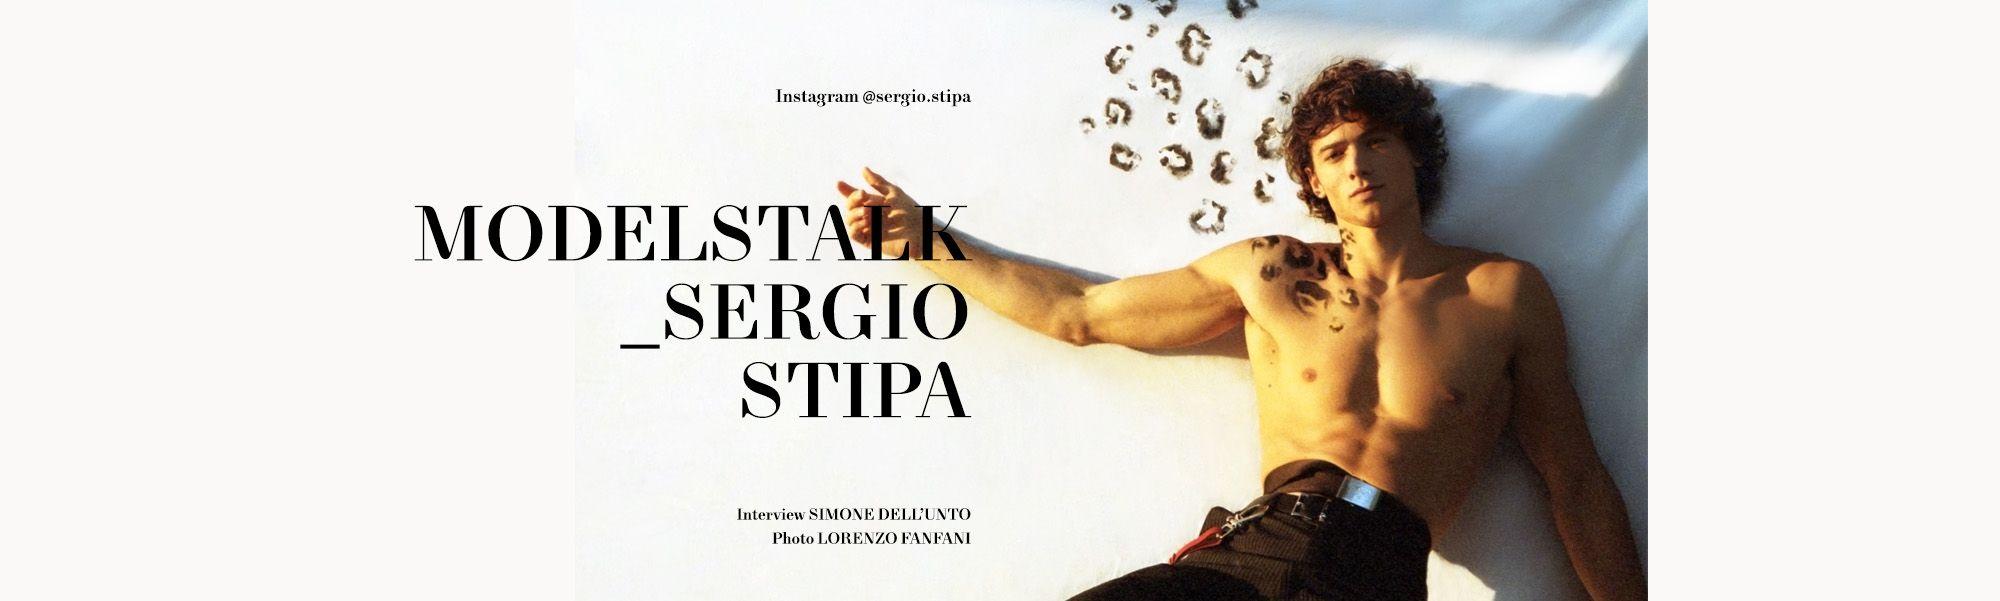 sergio-stipa-thegreatestmagazine-banner